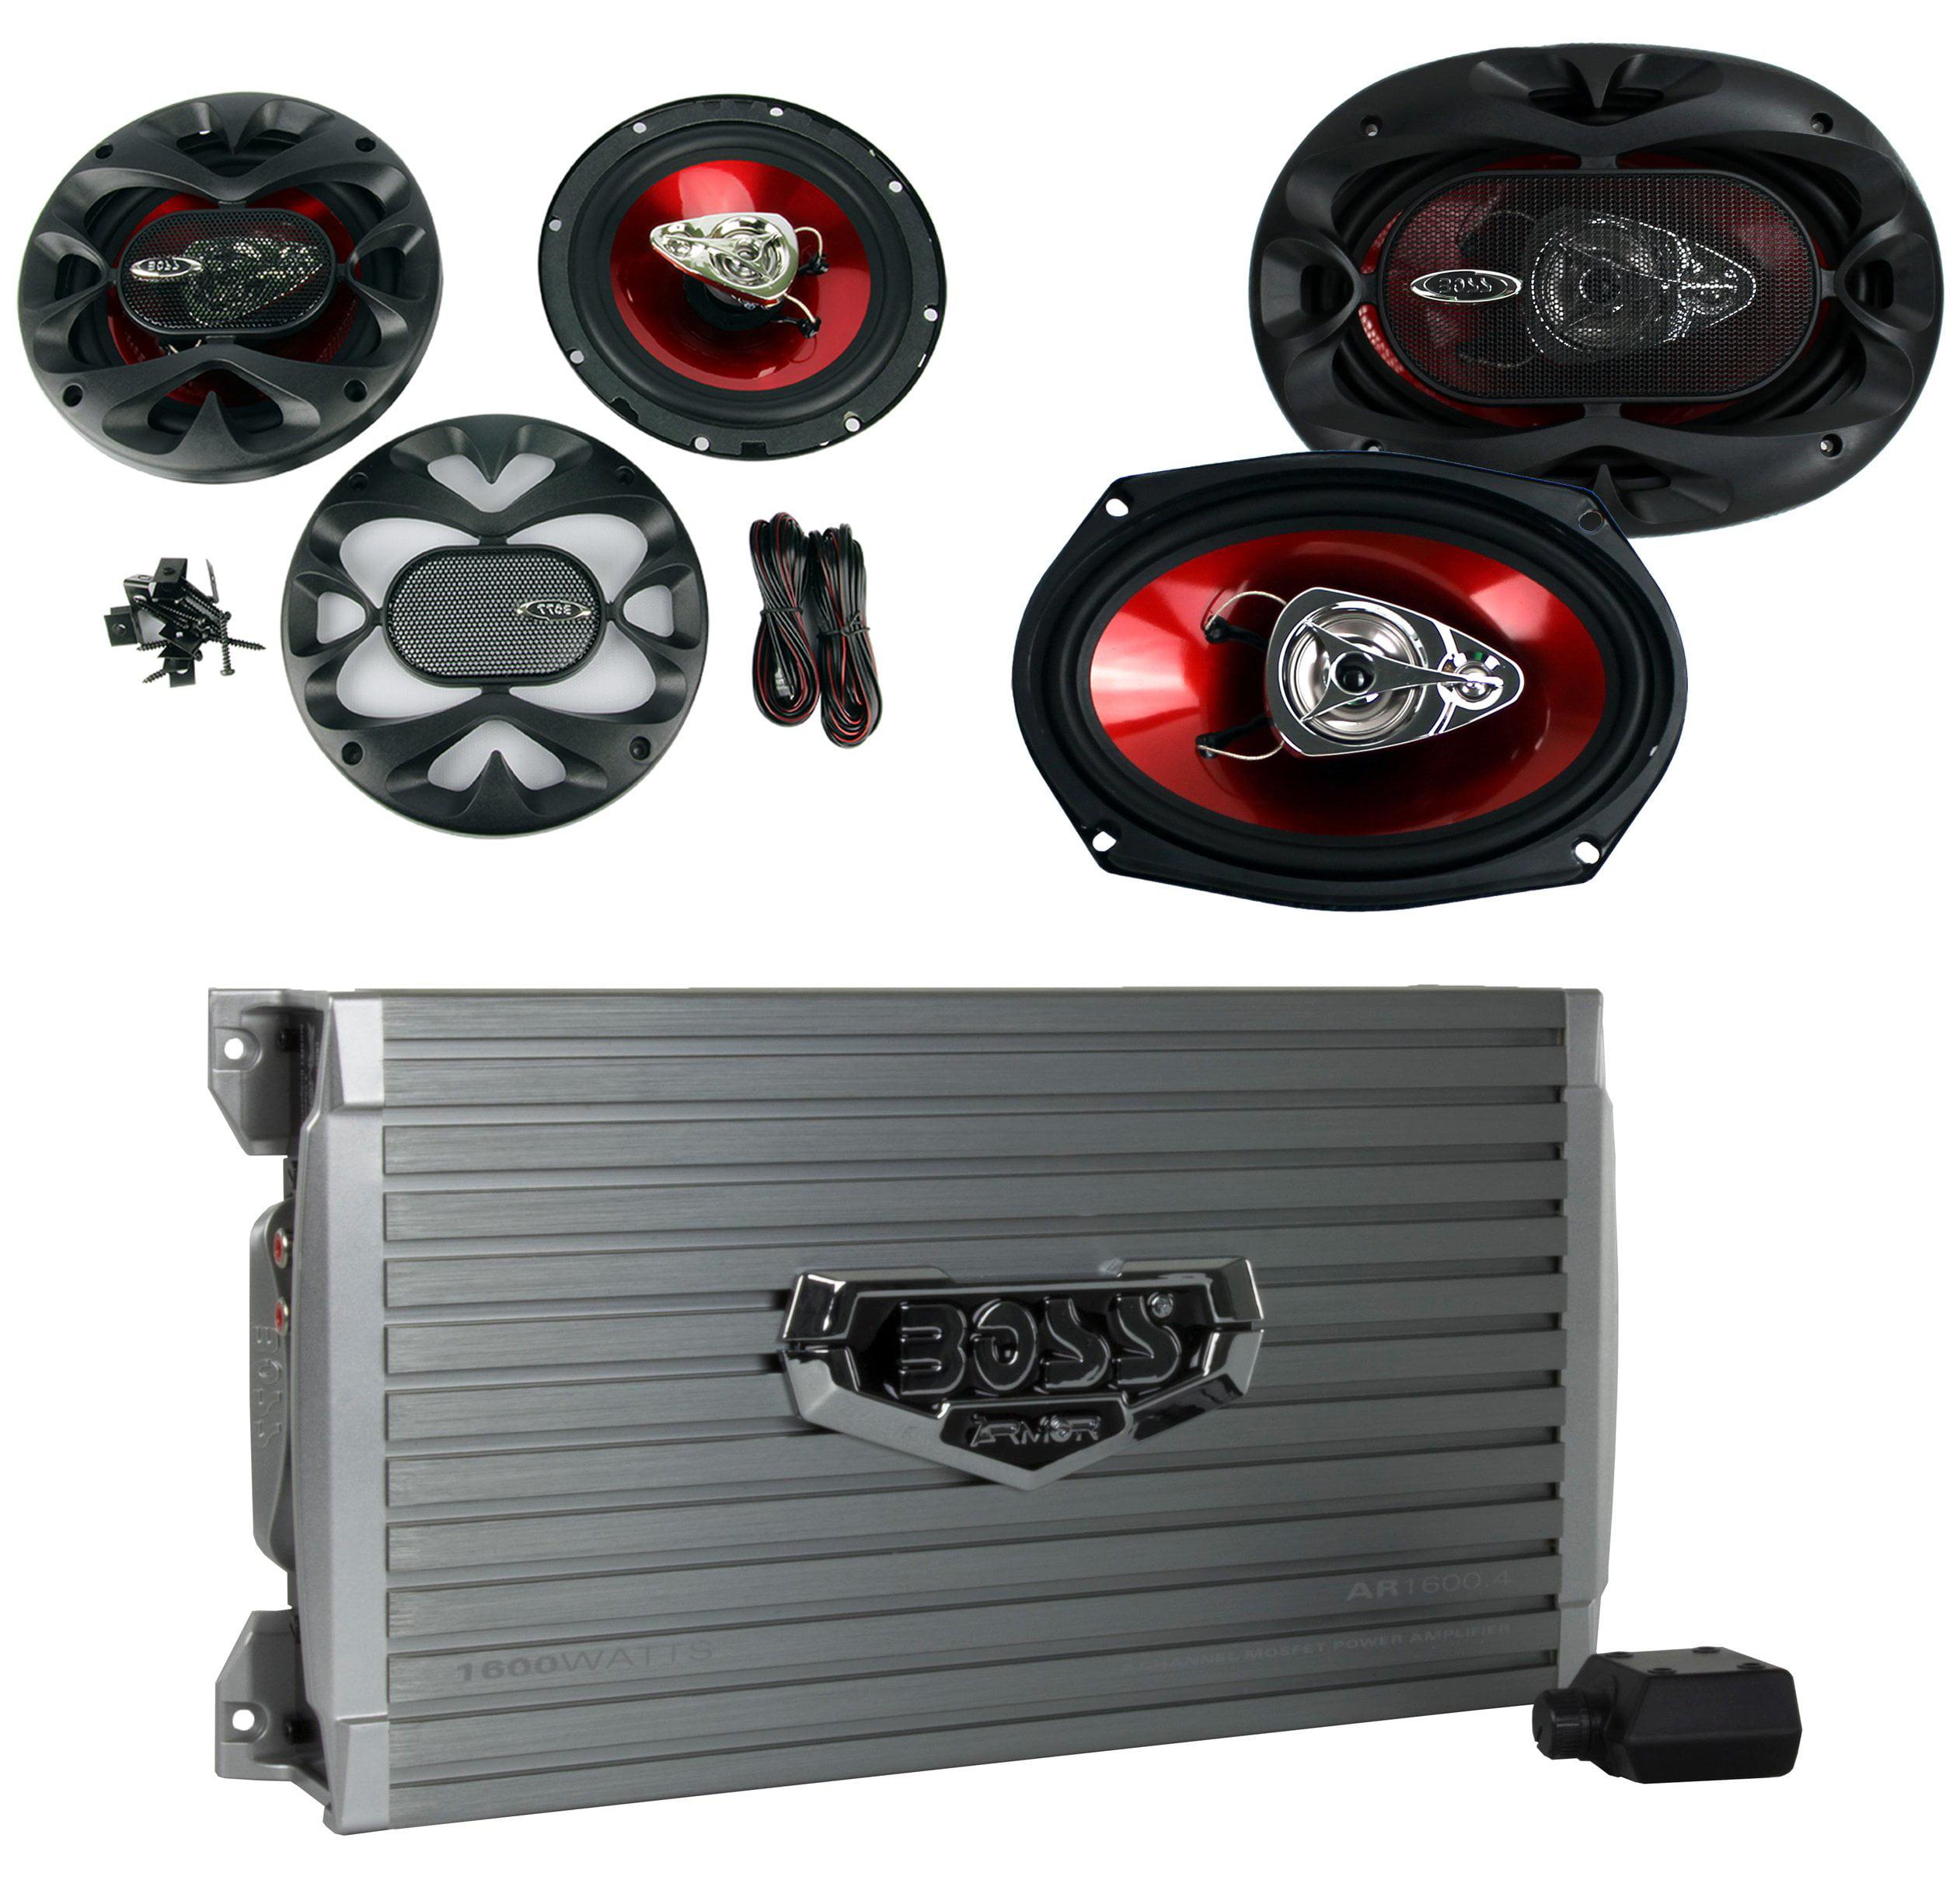 "BOSS AUDIO AR1600.4 1600W 4 Channel Car Amplifier Amp+Remote+ 6.5""/6x9"" Speakers"